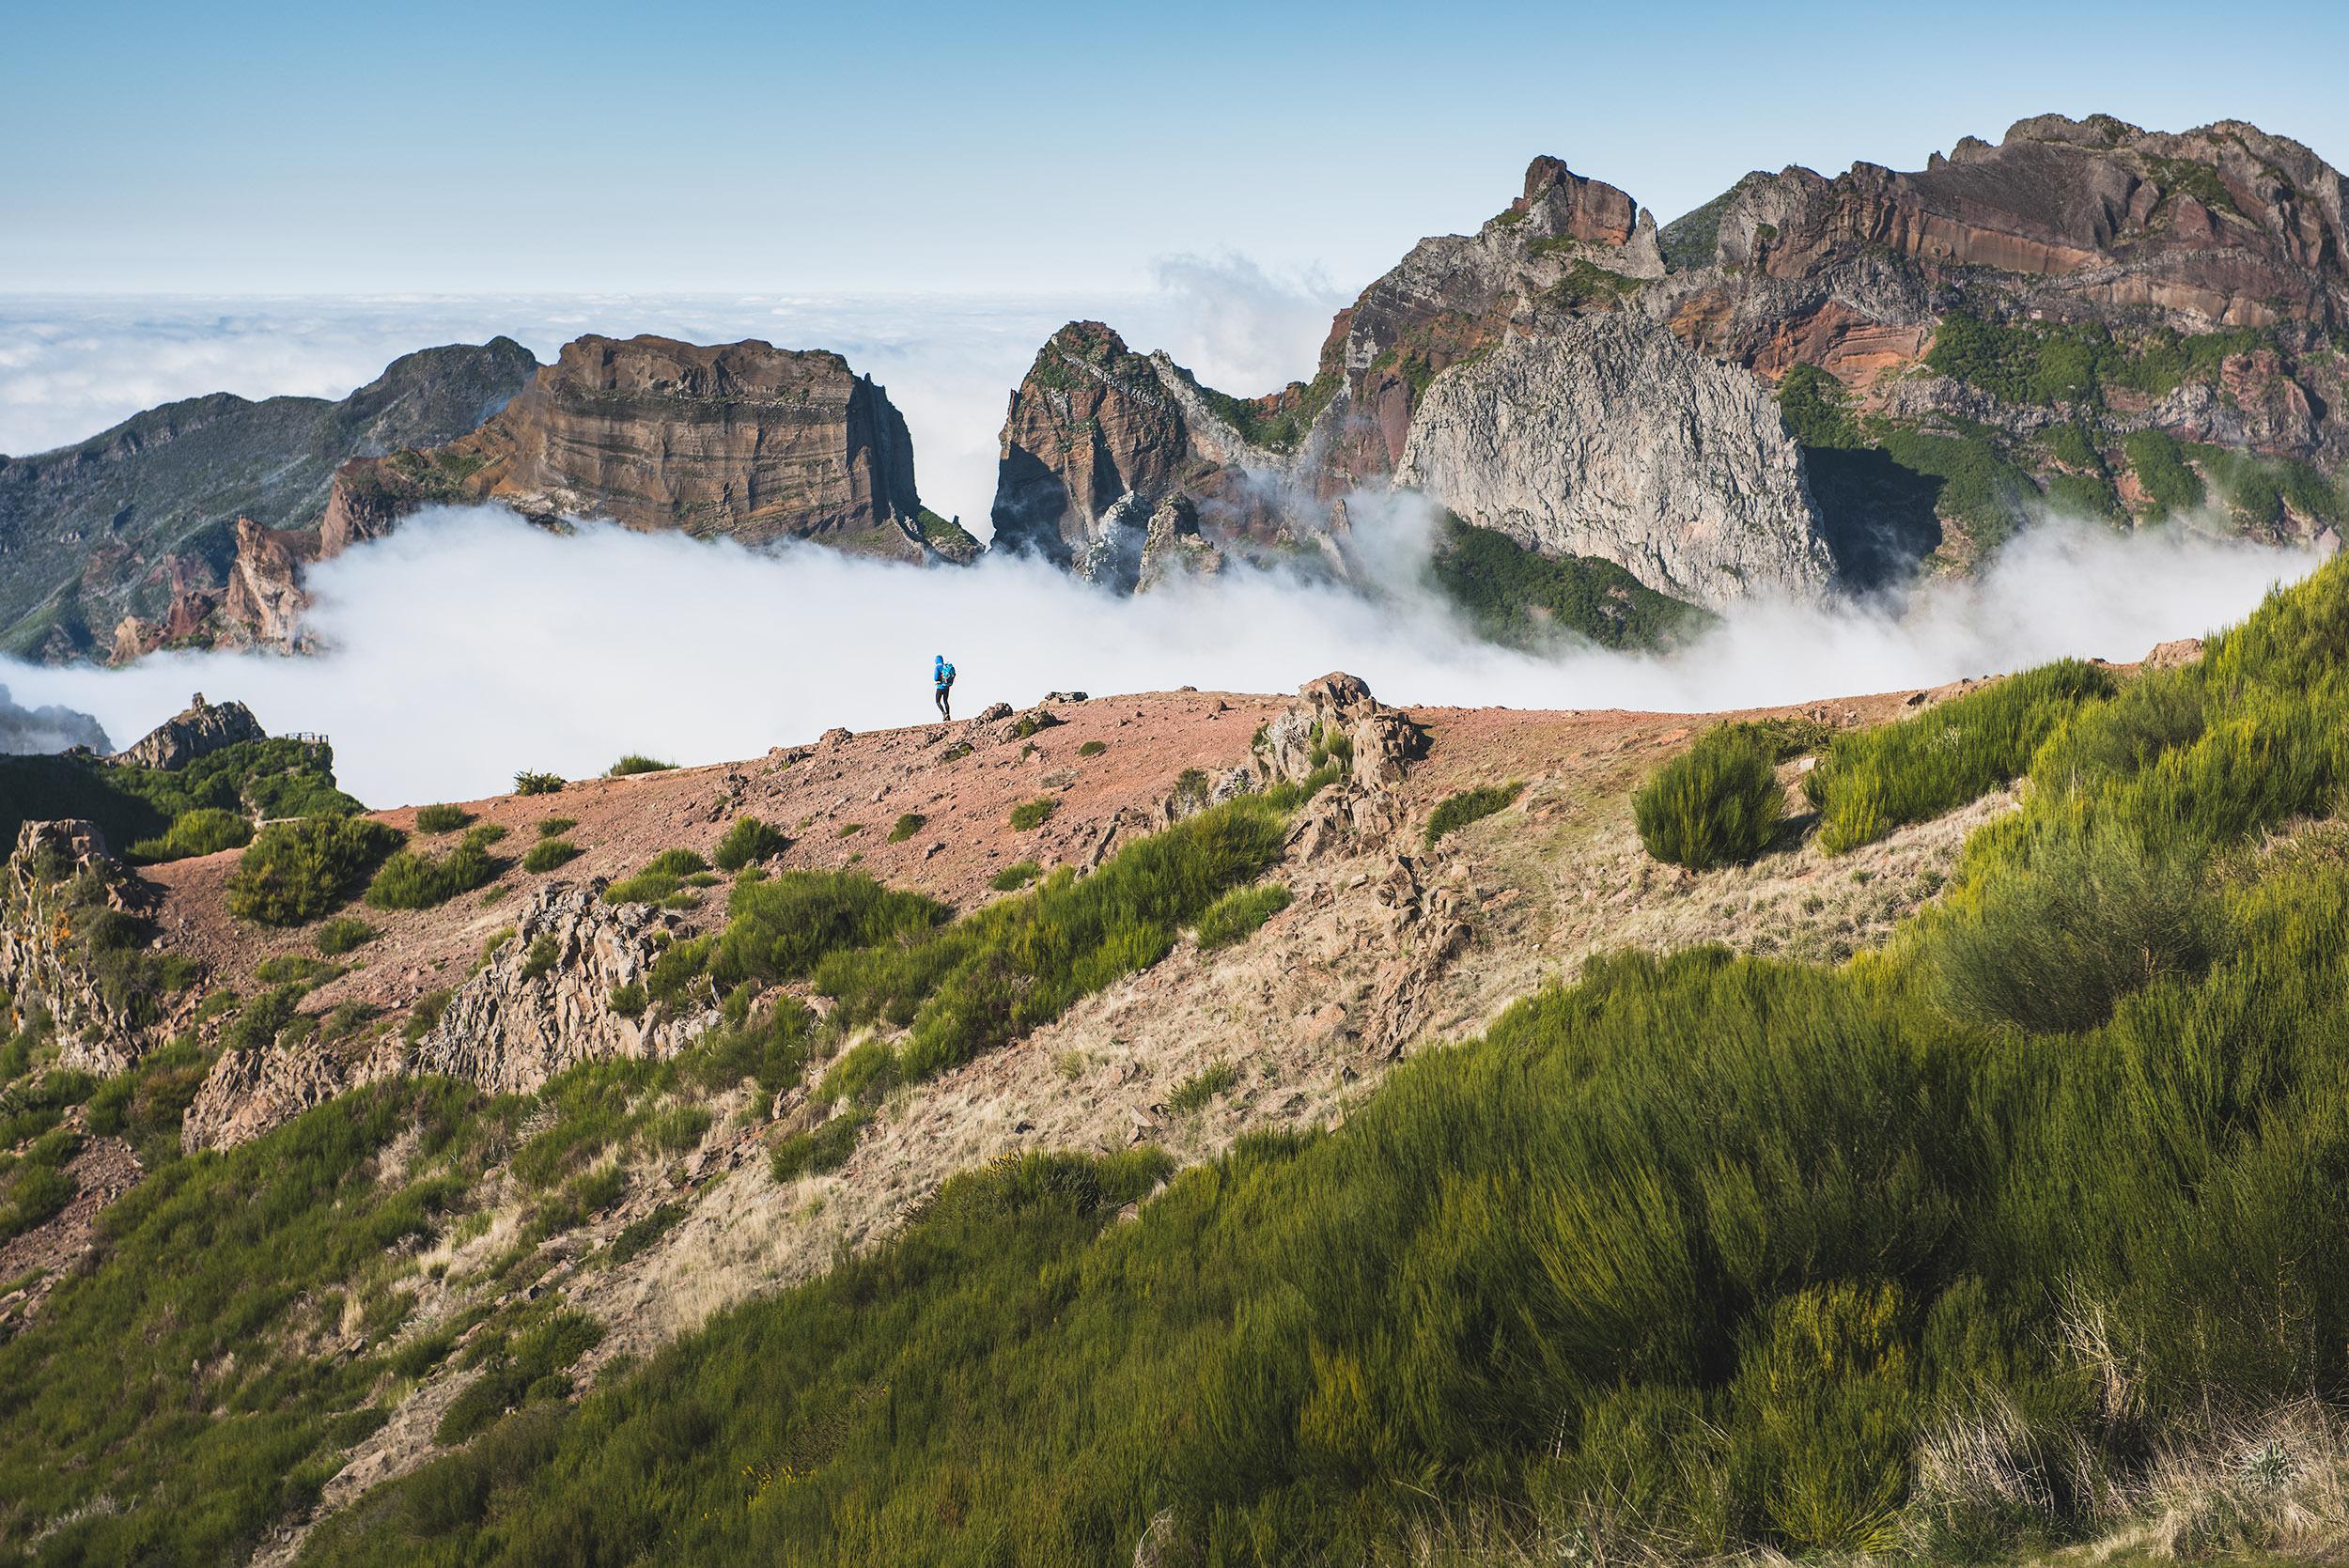 19-outdoor-adventure-mountains-hiking-madeira-island-clouds.jpg